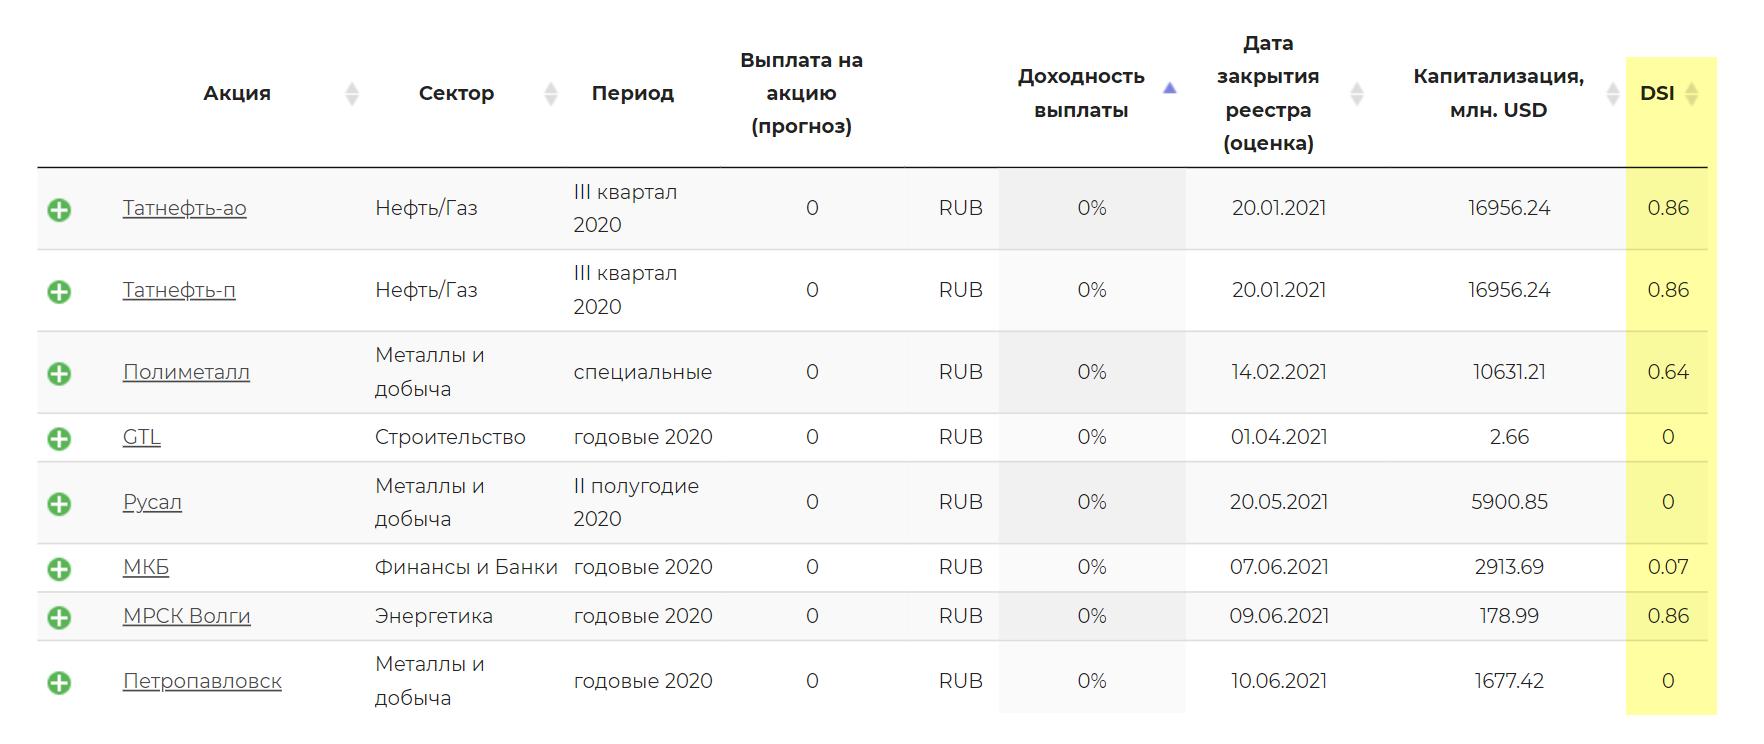 Значения индекса DSI дляроссийских компаний на сайте dohod.ru